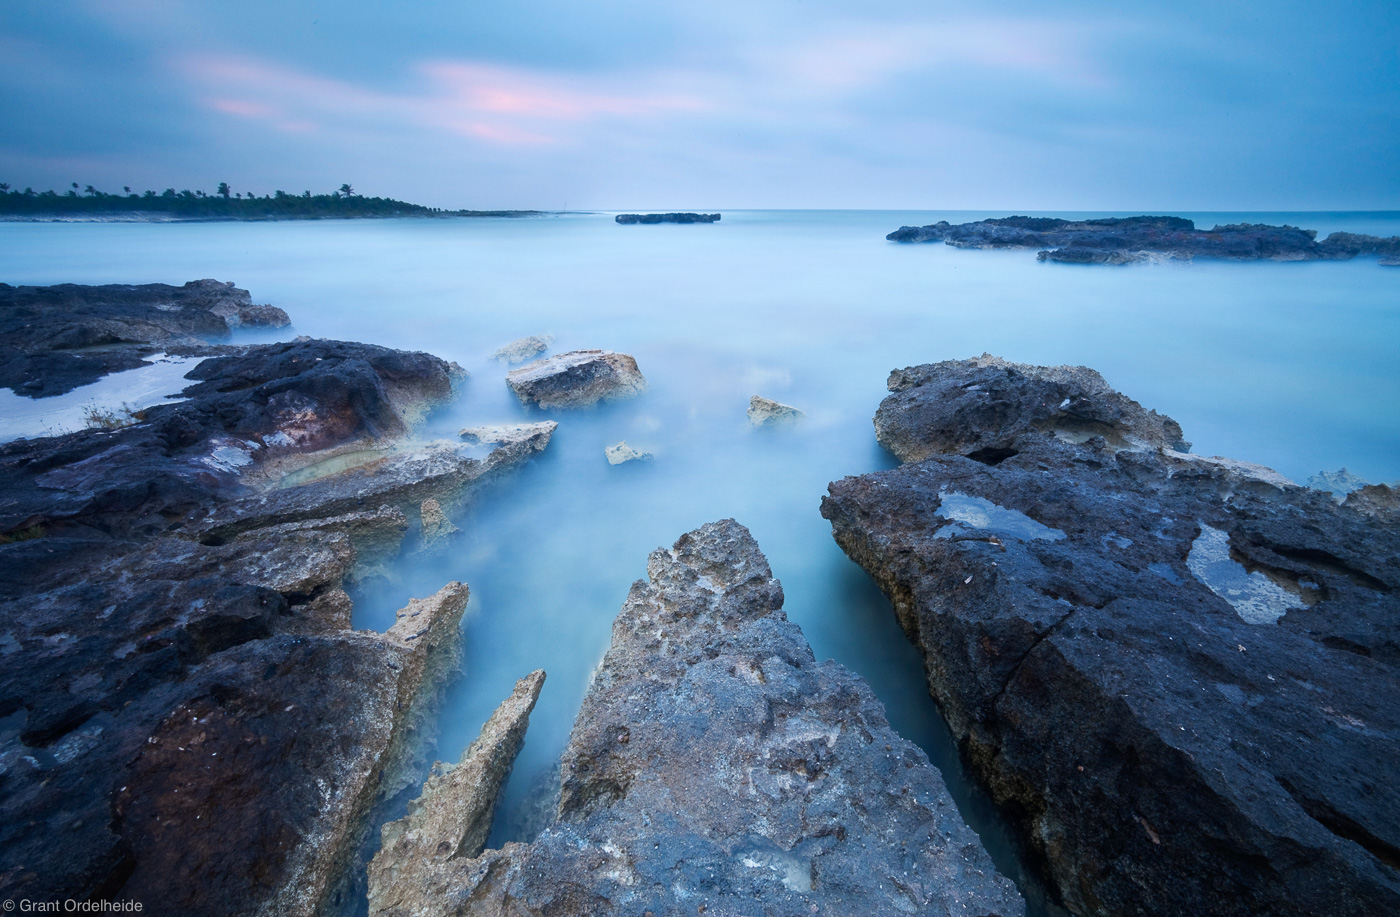 akumal, lagoon, water, long exposure, lava, rocks, lines, unique, mexico, yucatan peninsula, photo